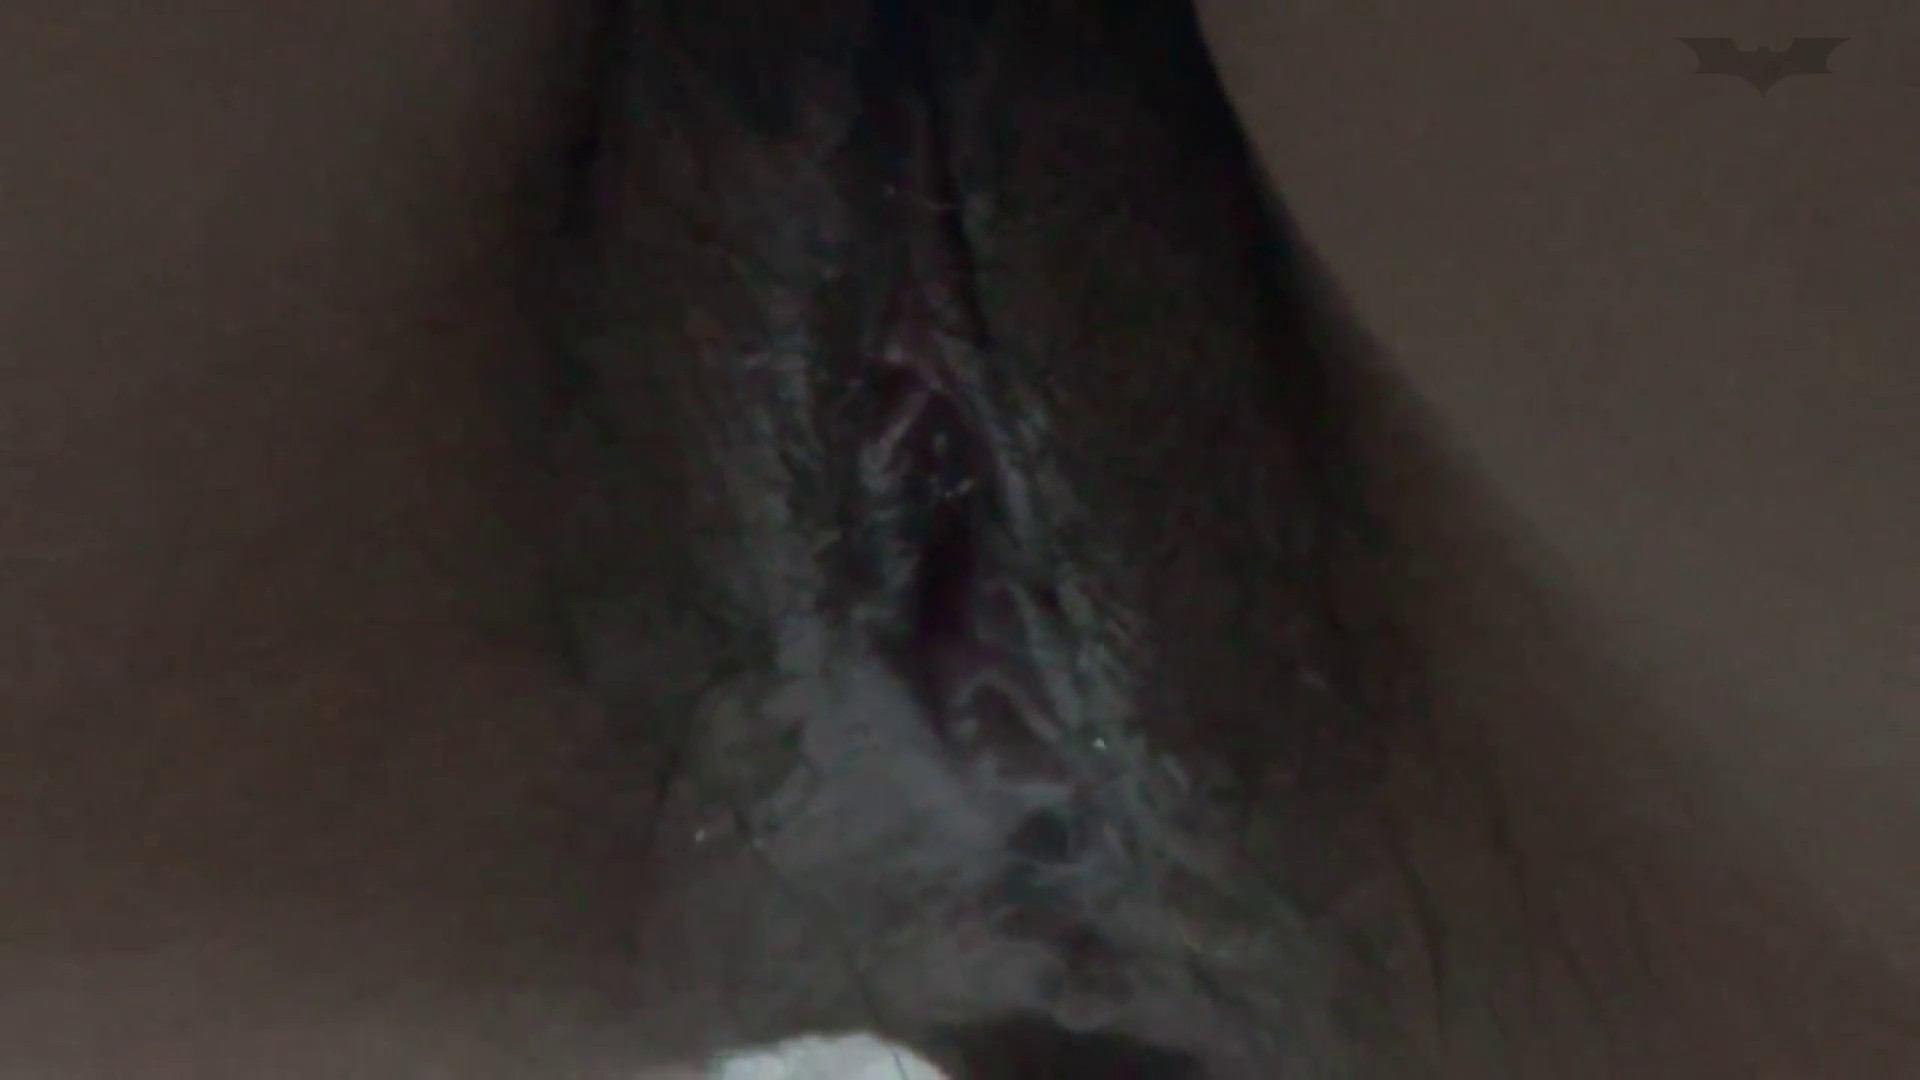 JD盗撮 美女の洗面所の秘密 Vol.44 ギャル攻め ワレメ無修正動画無料 56画像 14